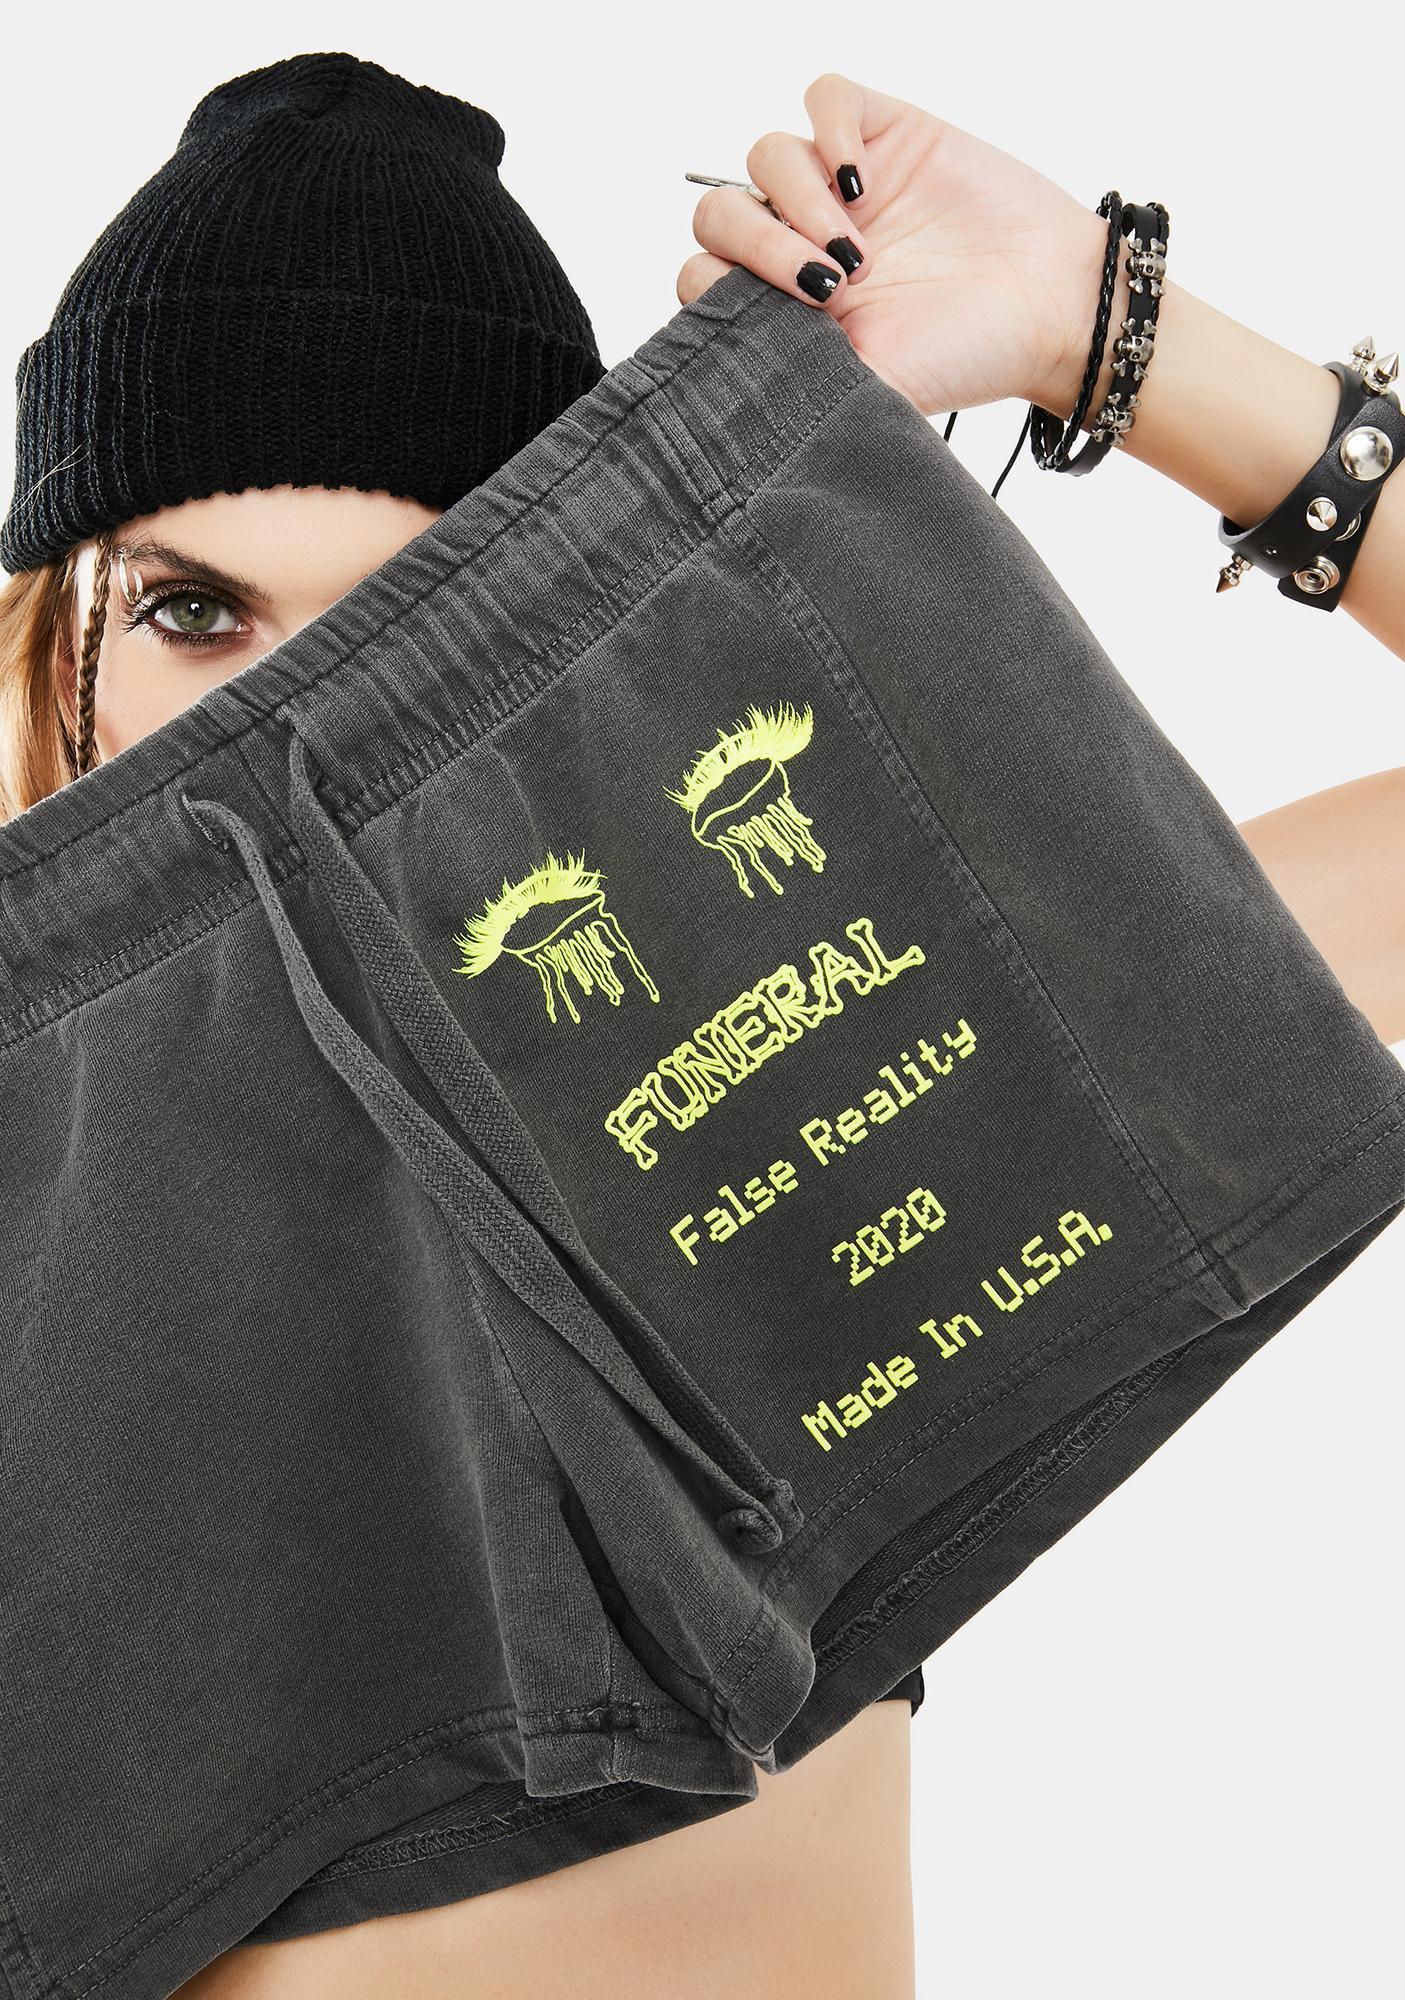 Funeral Washed Black 2020 Lounge Shorts